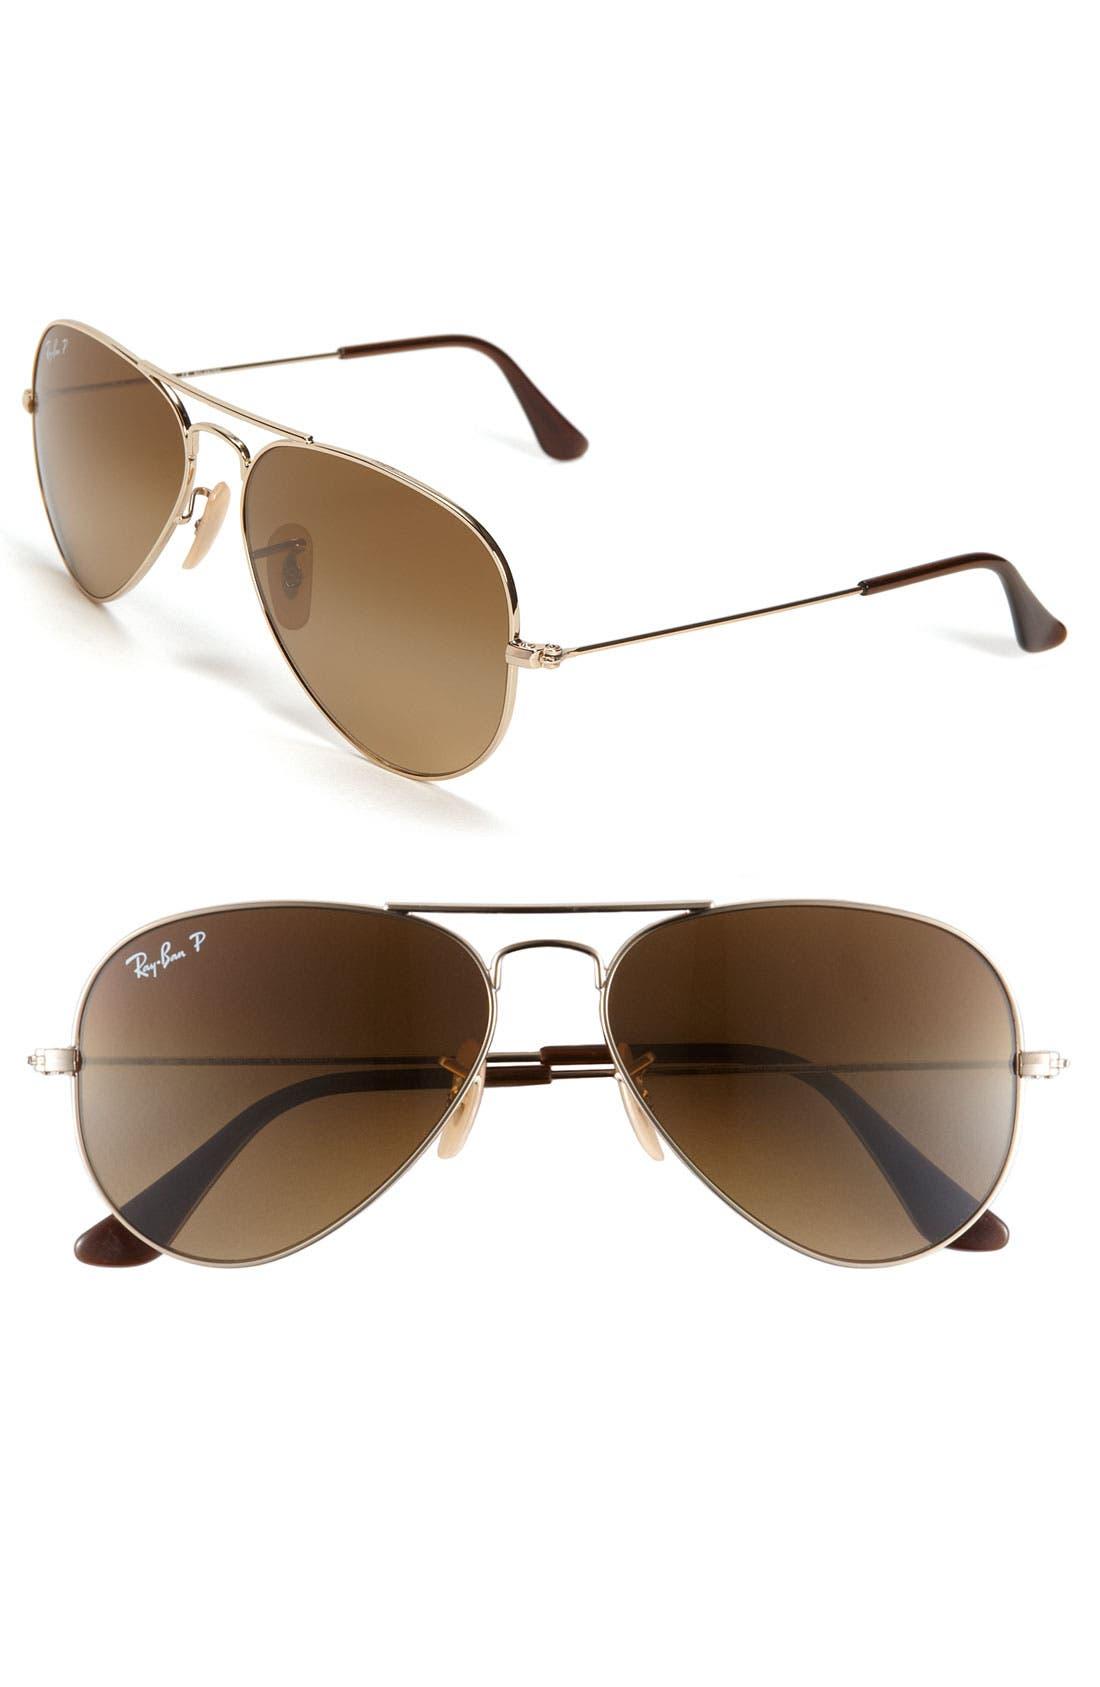 Main Image - Ray-Ban 'Original' Polarized Aviator Sunglasses